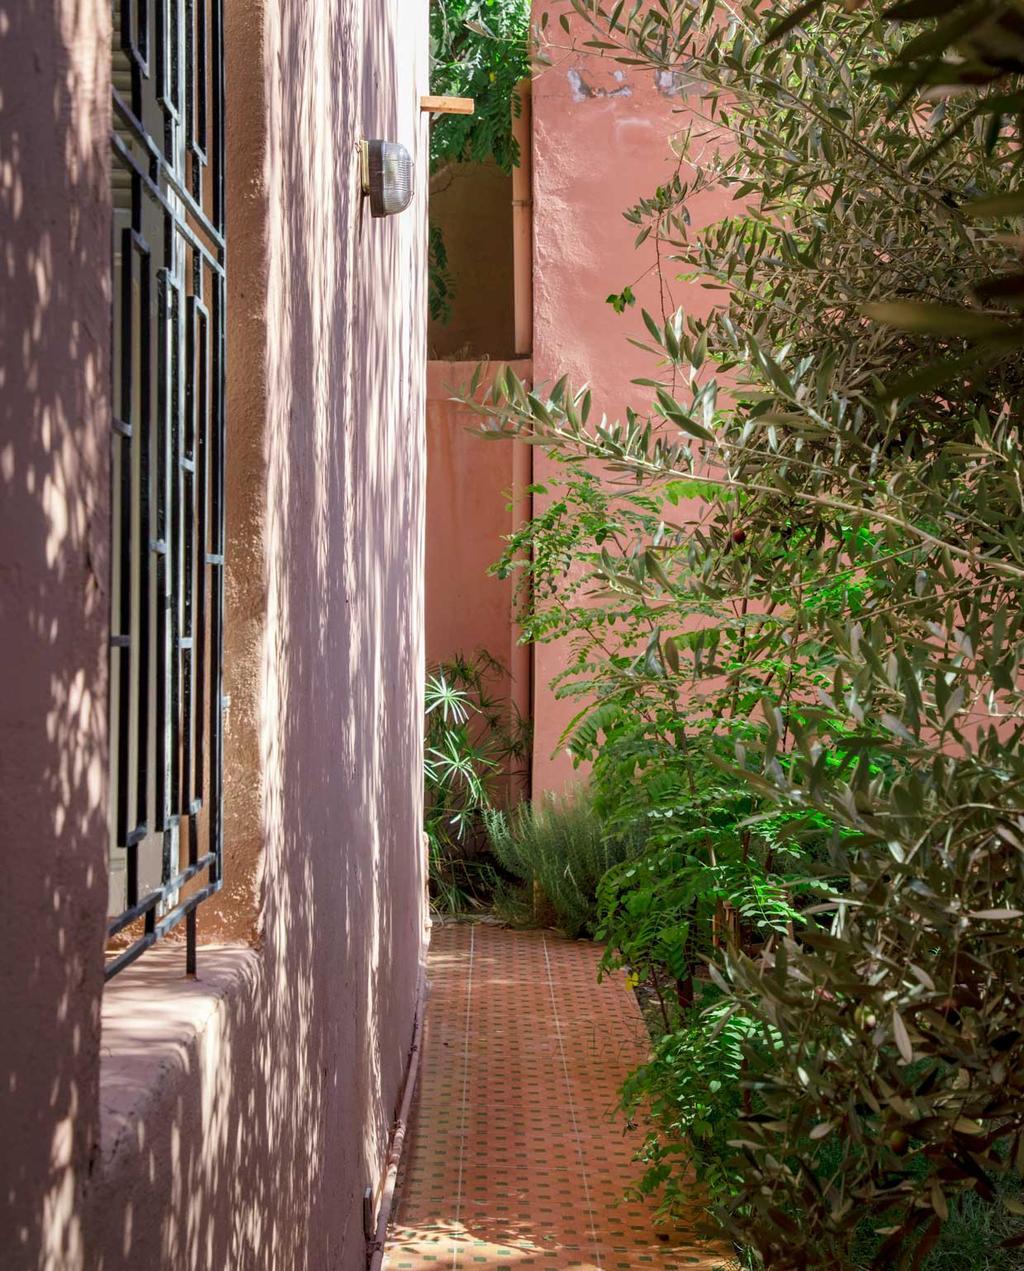 vtwonen 2020-09 | kijkkamer marrakech | Doorkijk patio marrakech